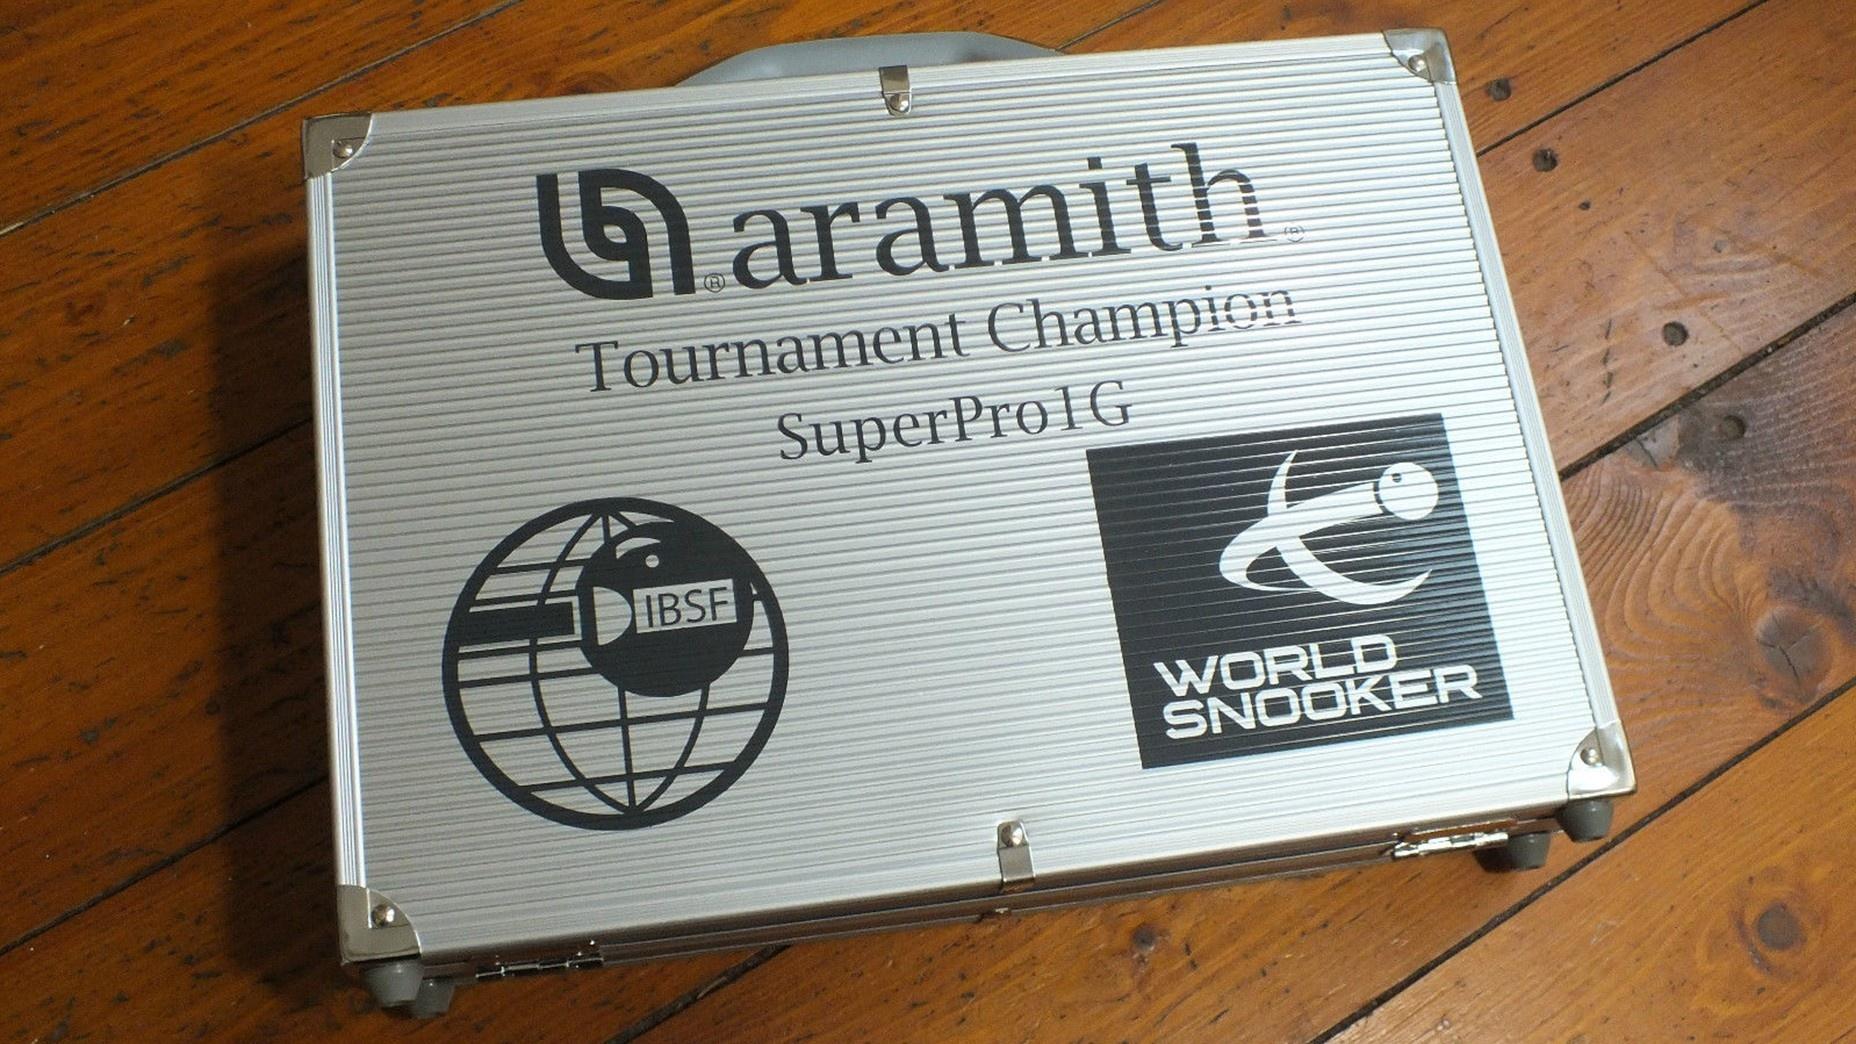 Aramith 1G Superpro World Champion Match Professional Snooker Balls in Case